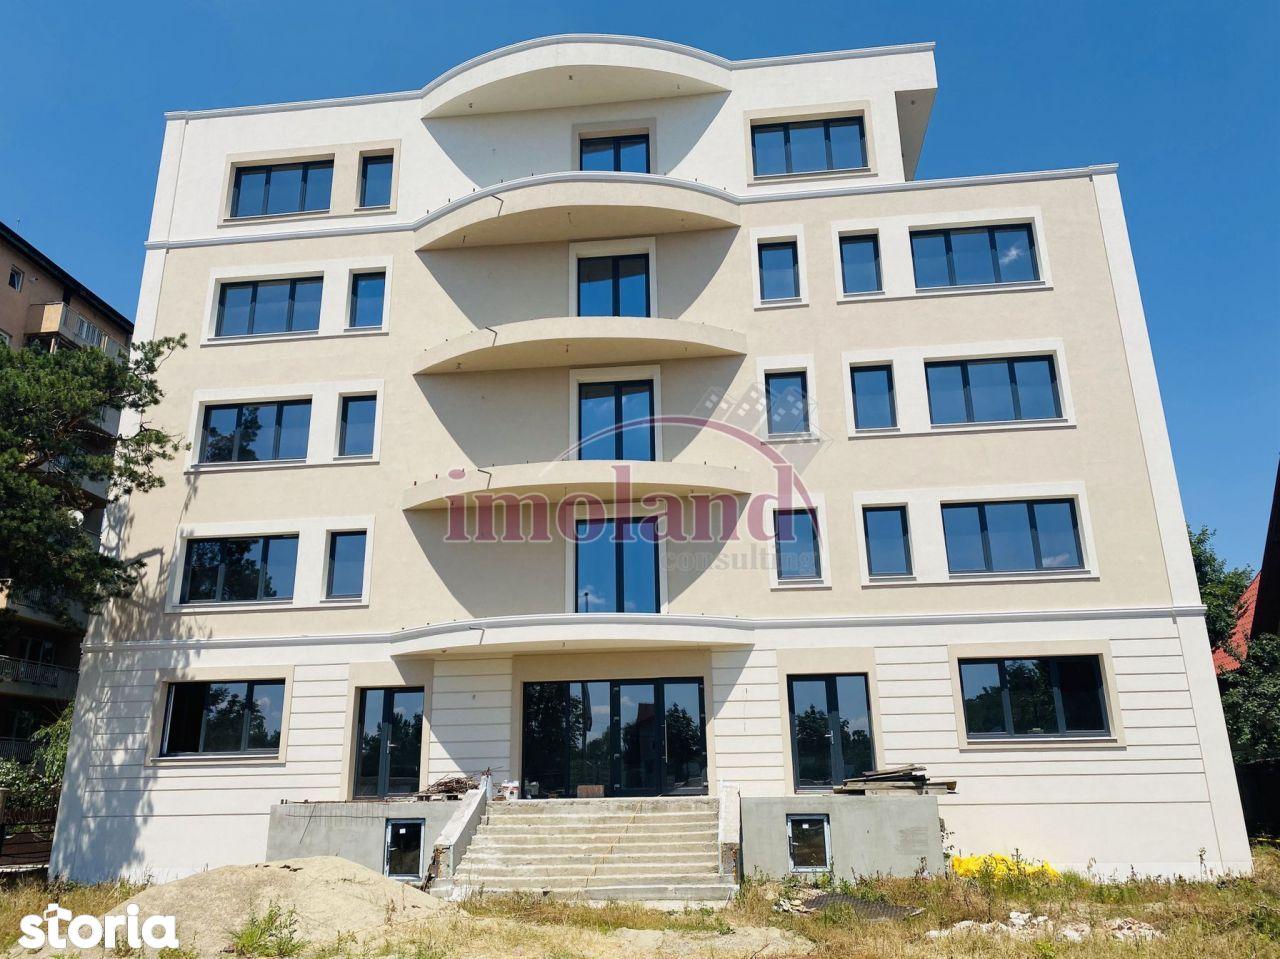 Spatii office-comercial - parter sau etaj - Pipera-Baneasa